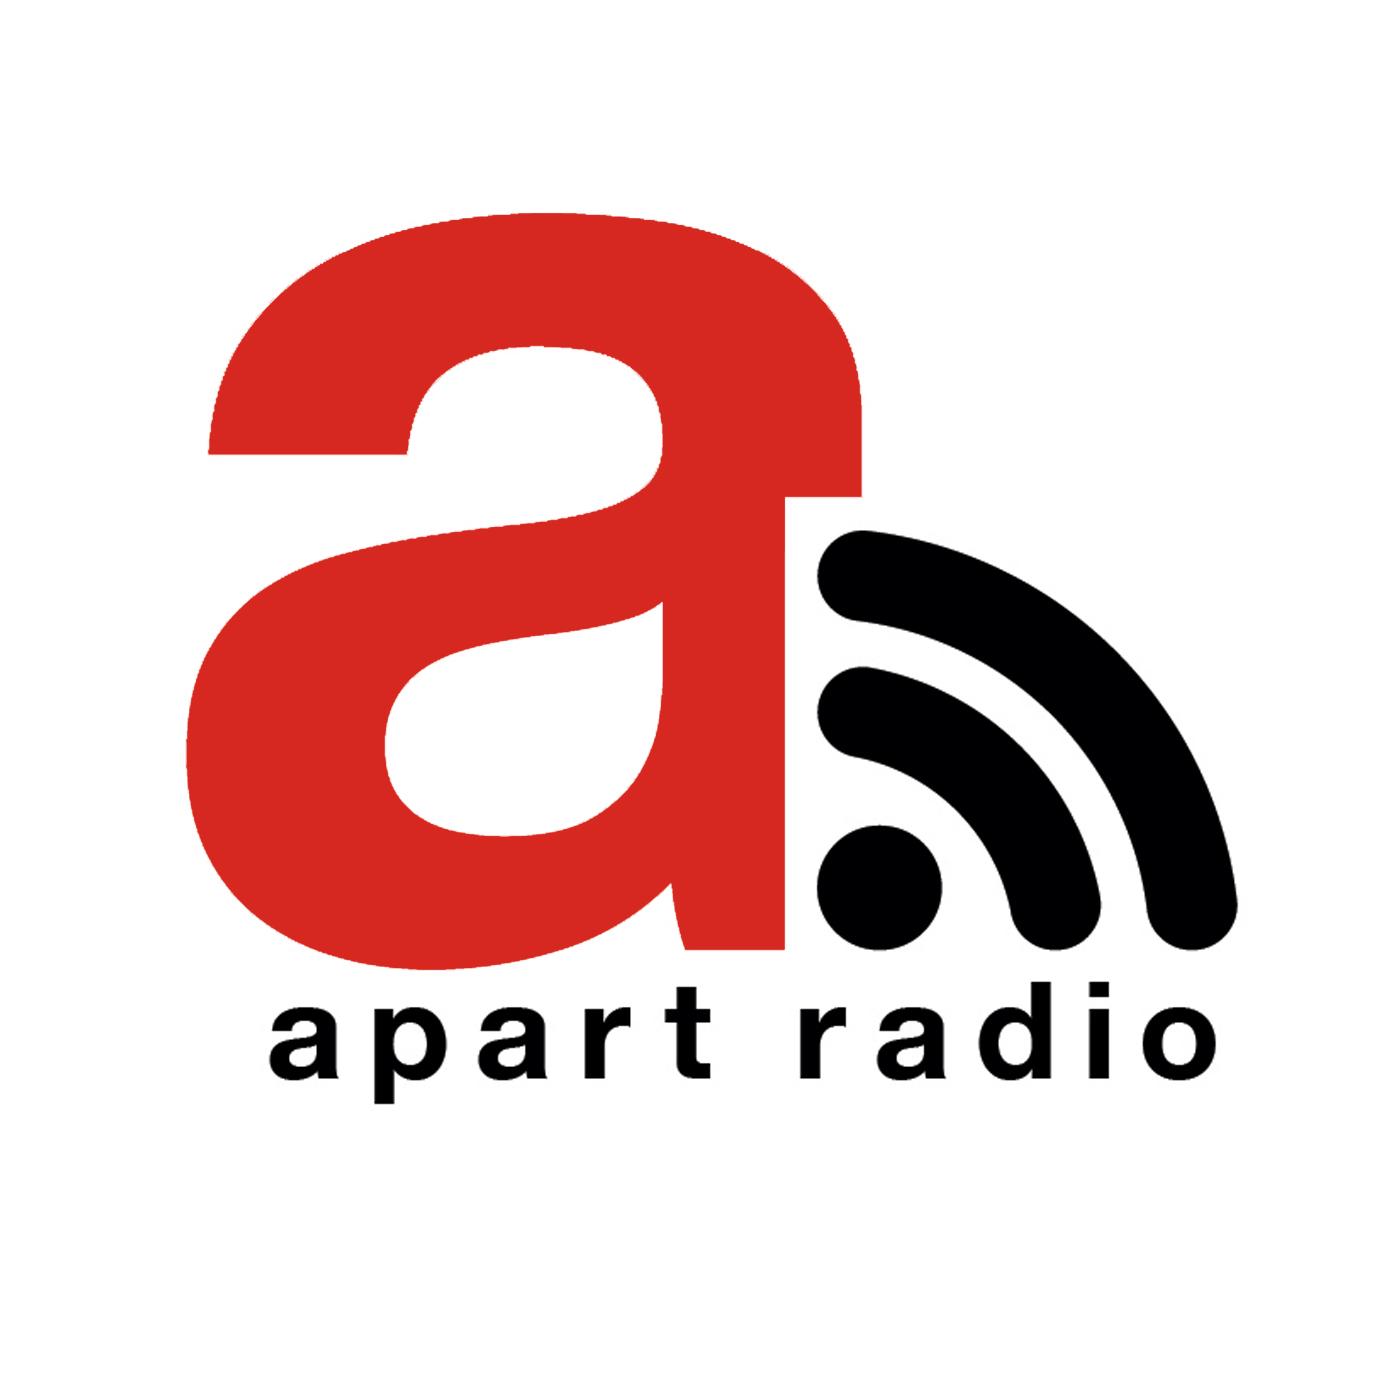 Apart Radio